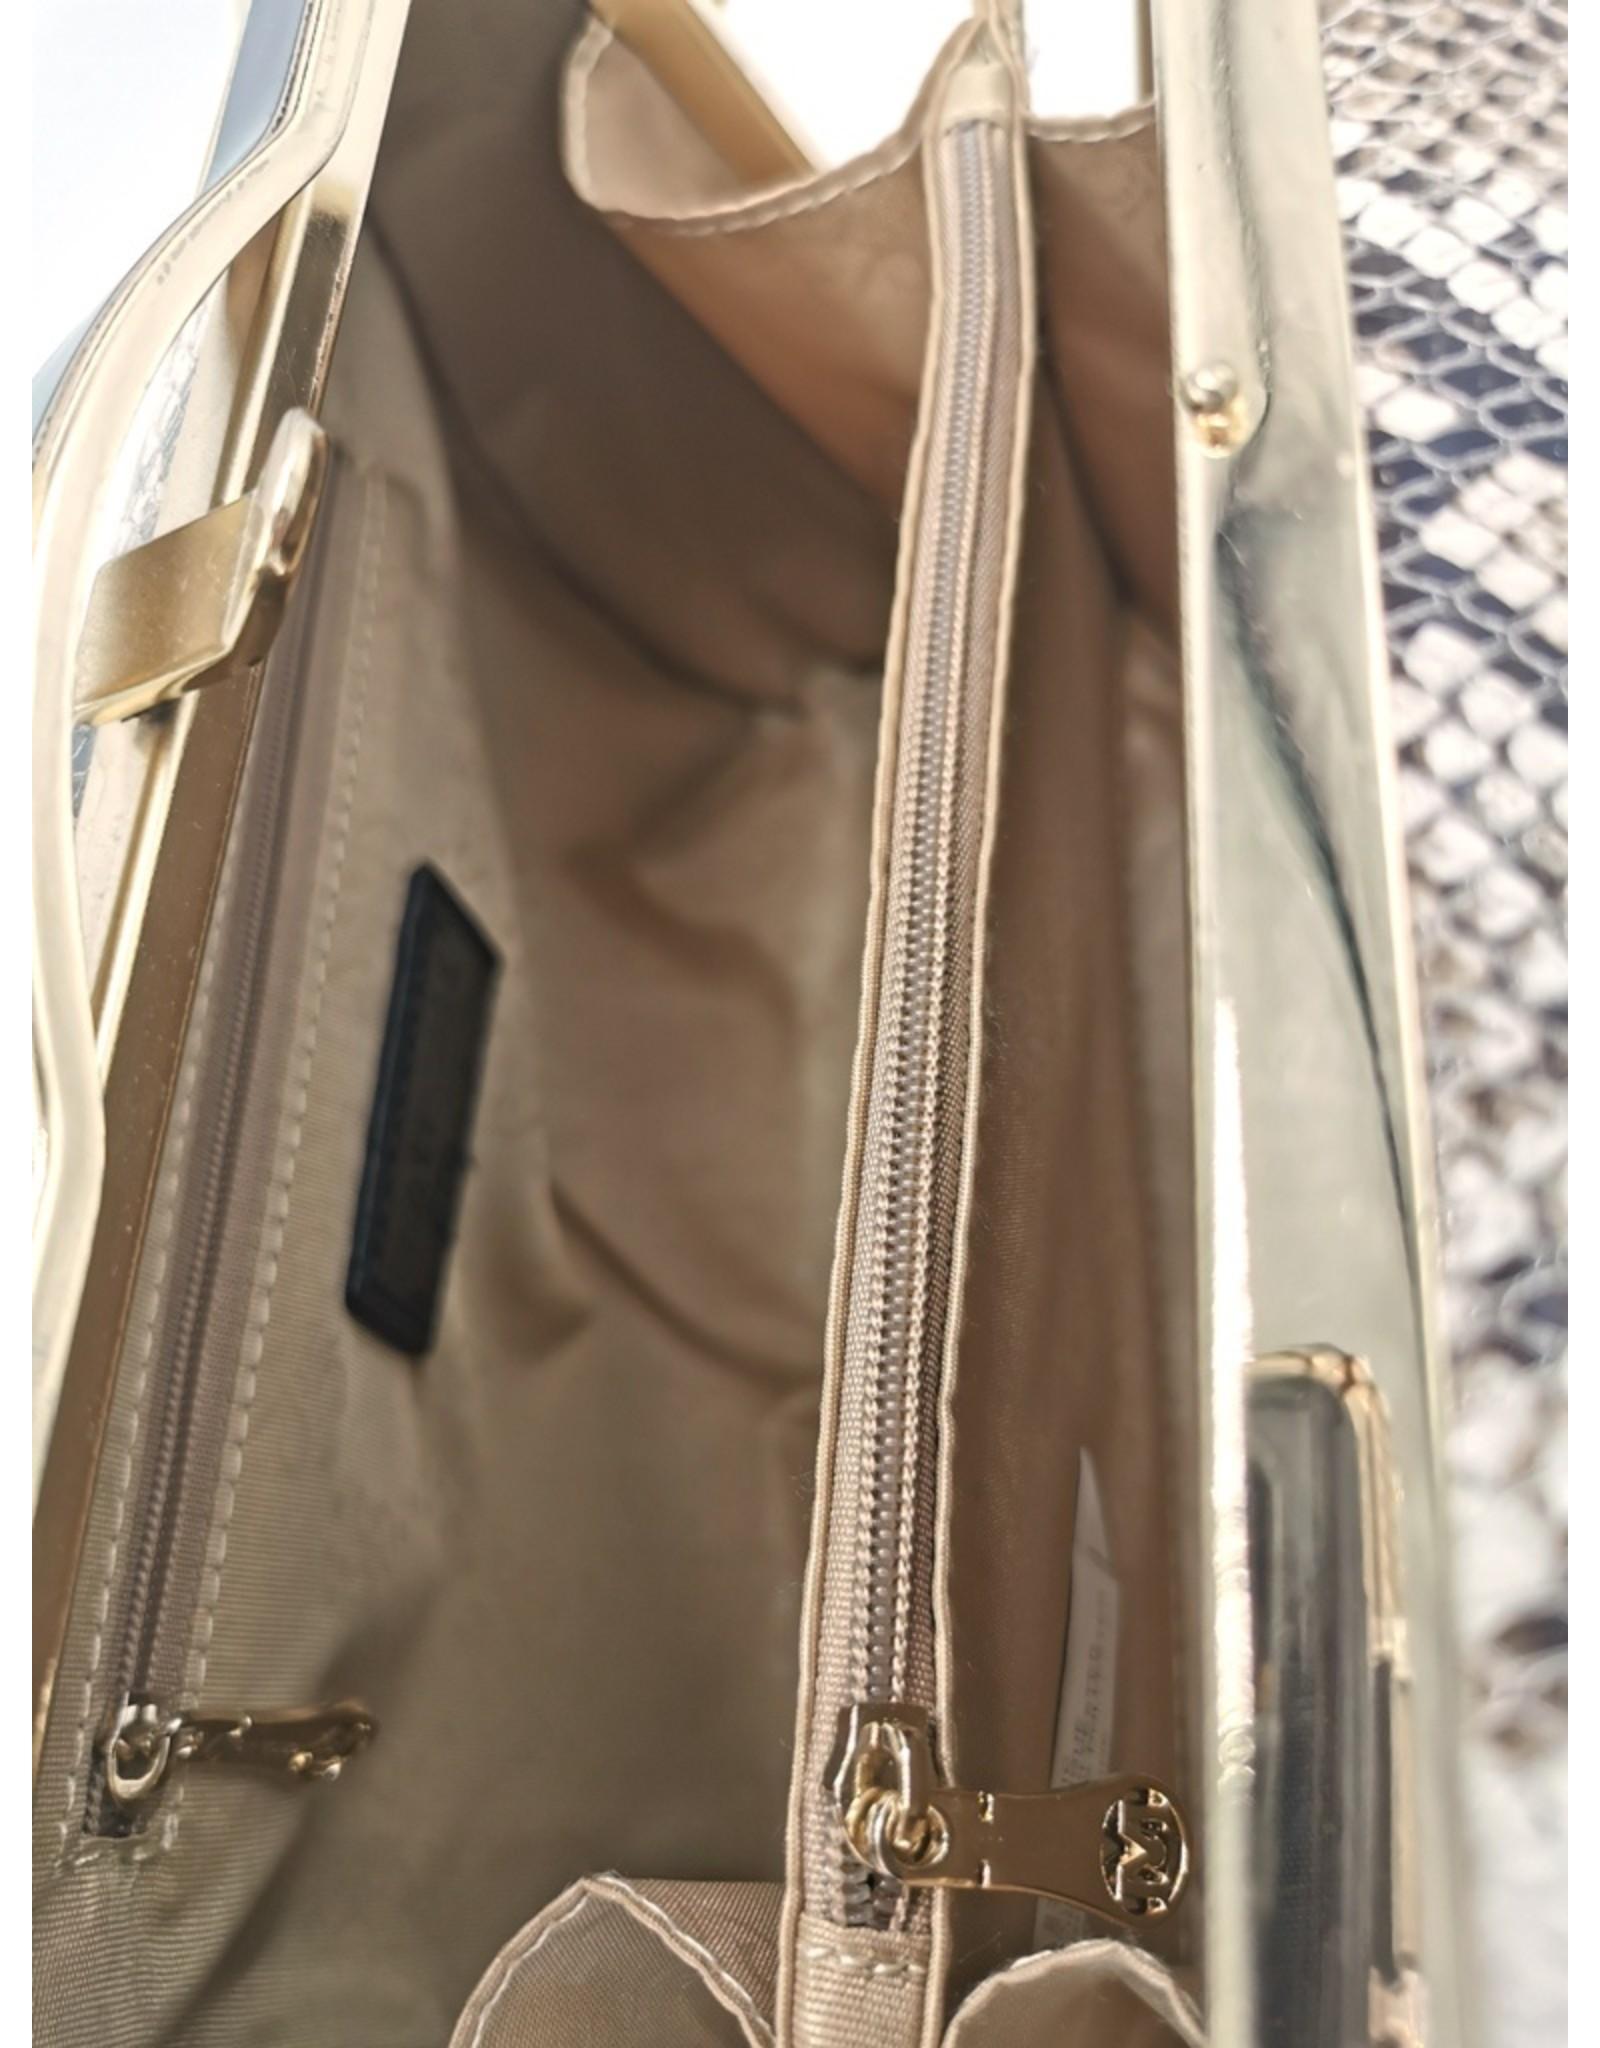 Lantadeli Retro bags  Vintage bags - Handbag with Snake print Vintage Style